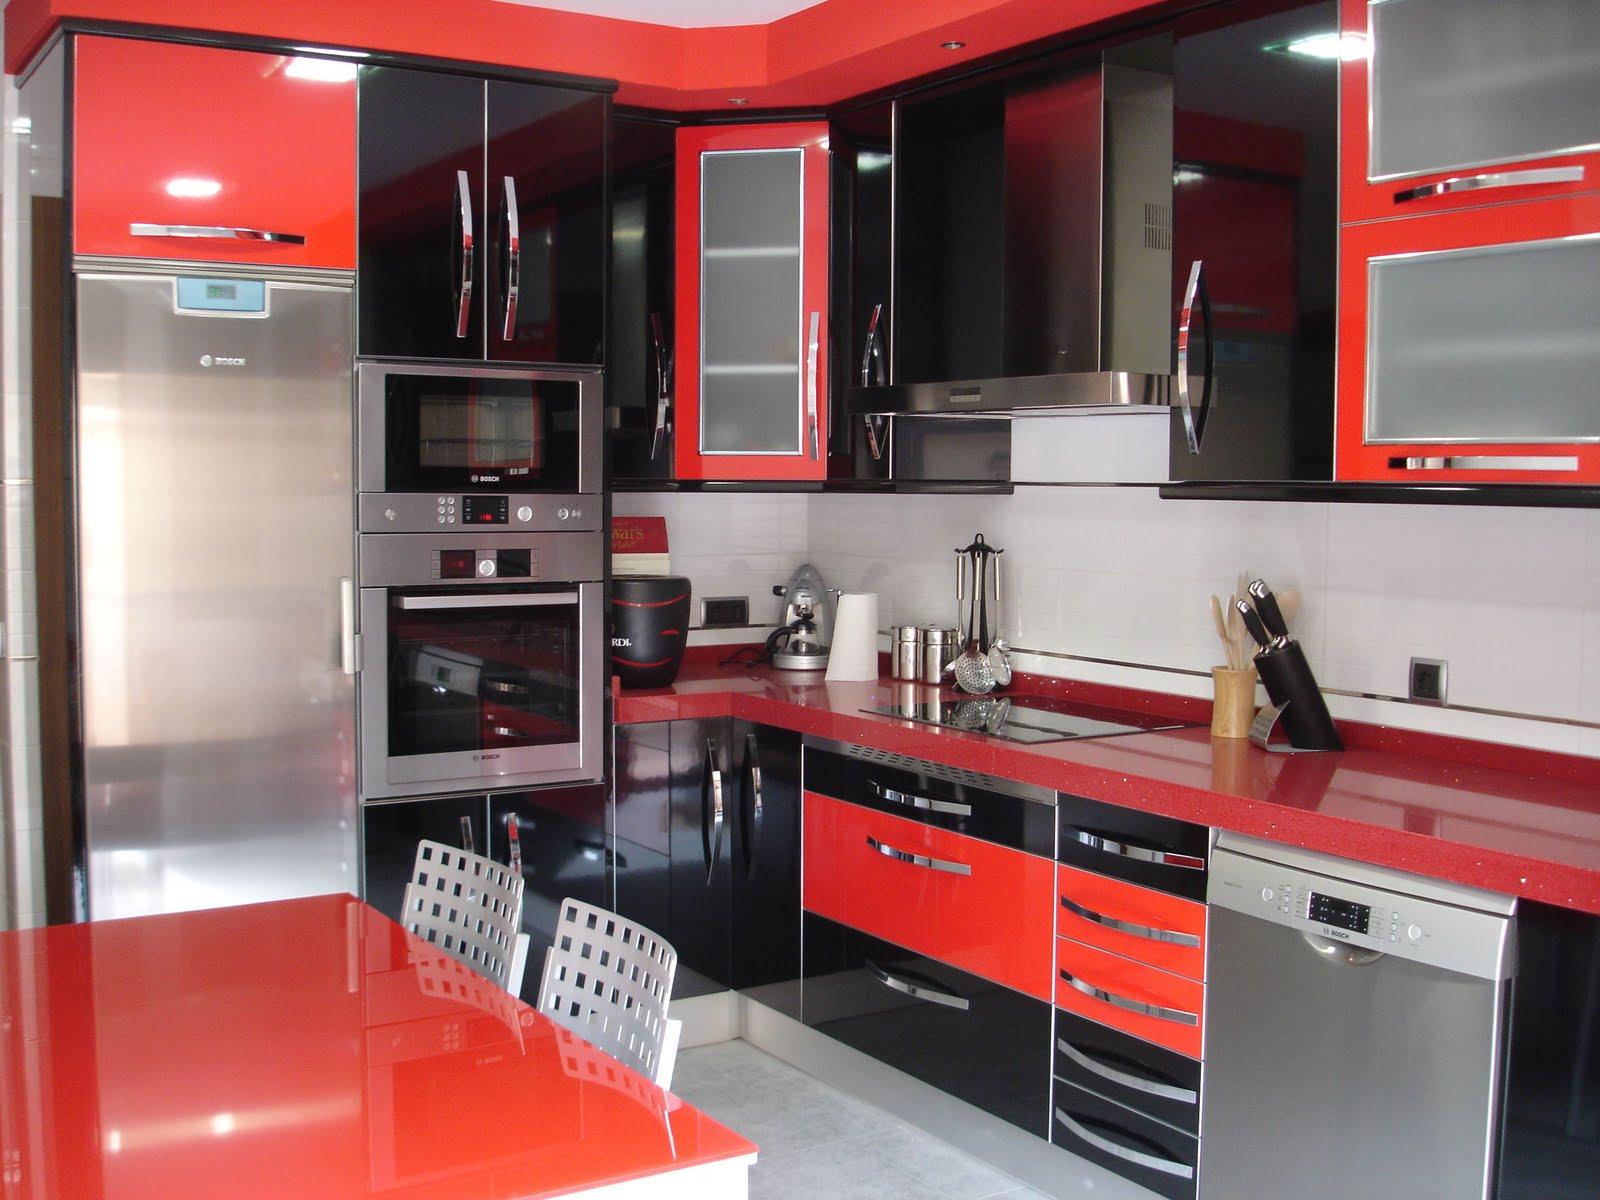 Mueblemina: Moderno Mueble de Cocina